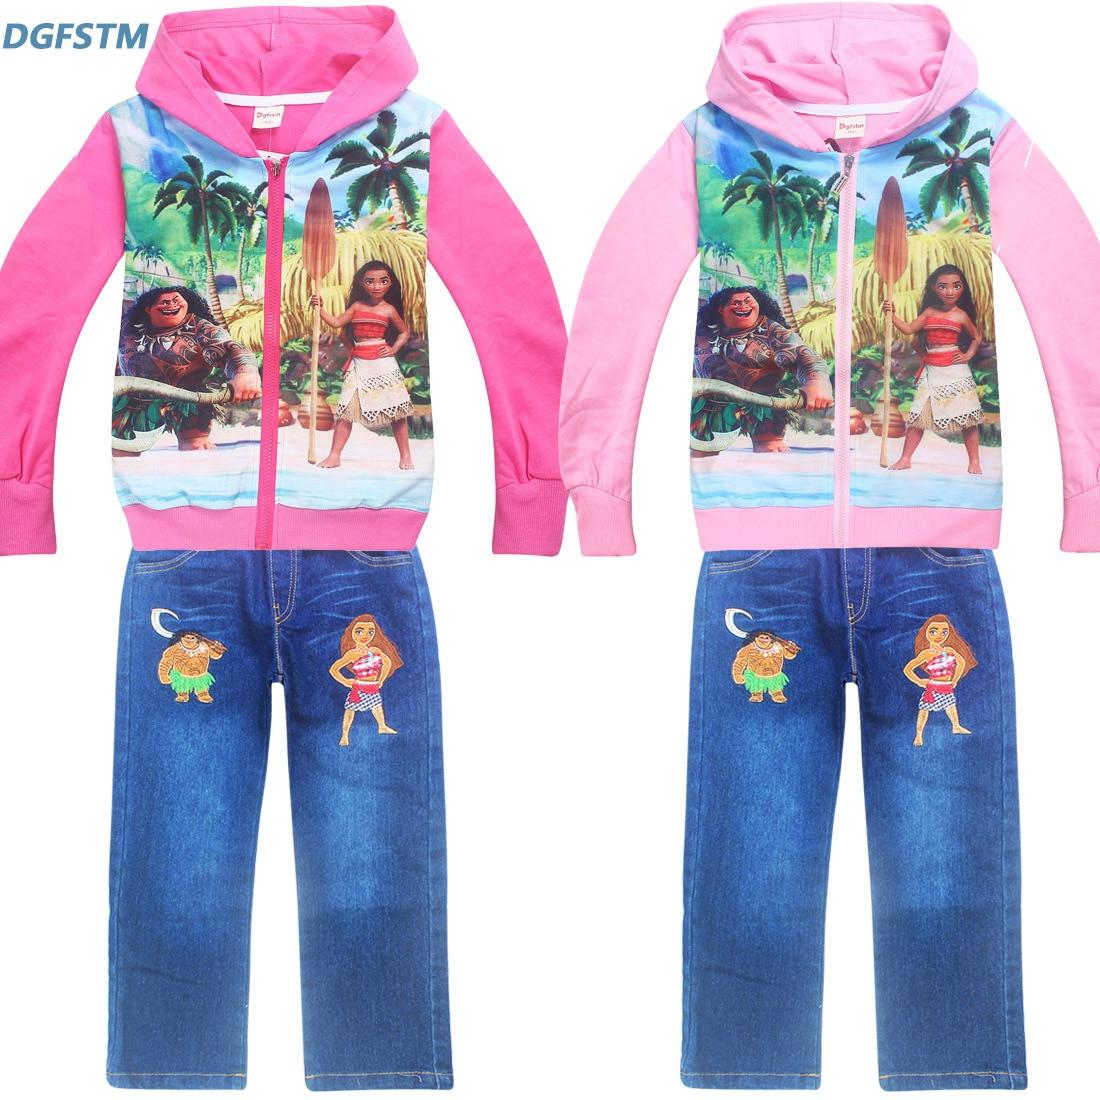 Newest Autumn Winter Clothing Set Moana vaiana cartoon Baby Girls Long Sleeved Cardigan +jeans Pant 2pcs/set Kids Sets for Girls<br>